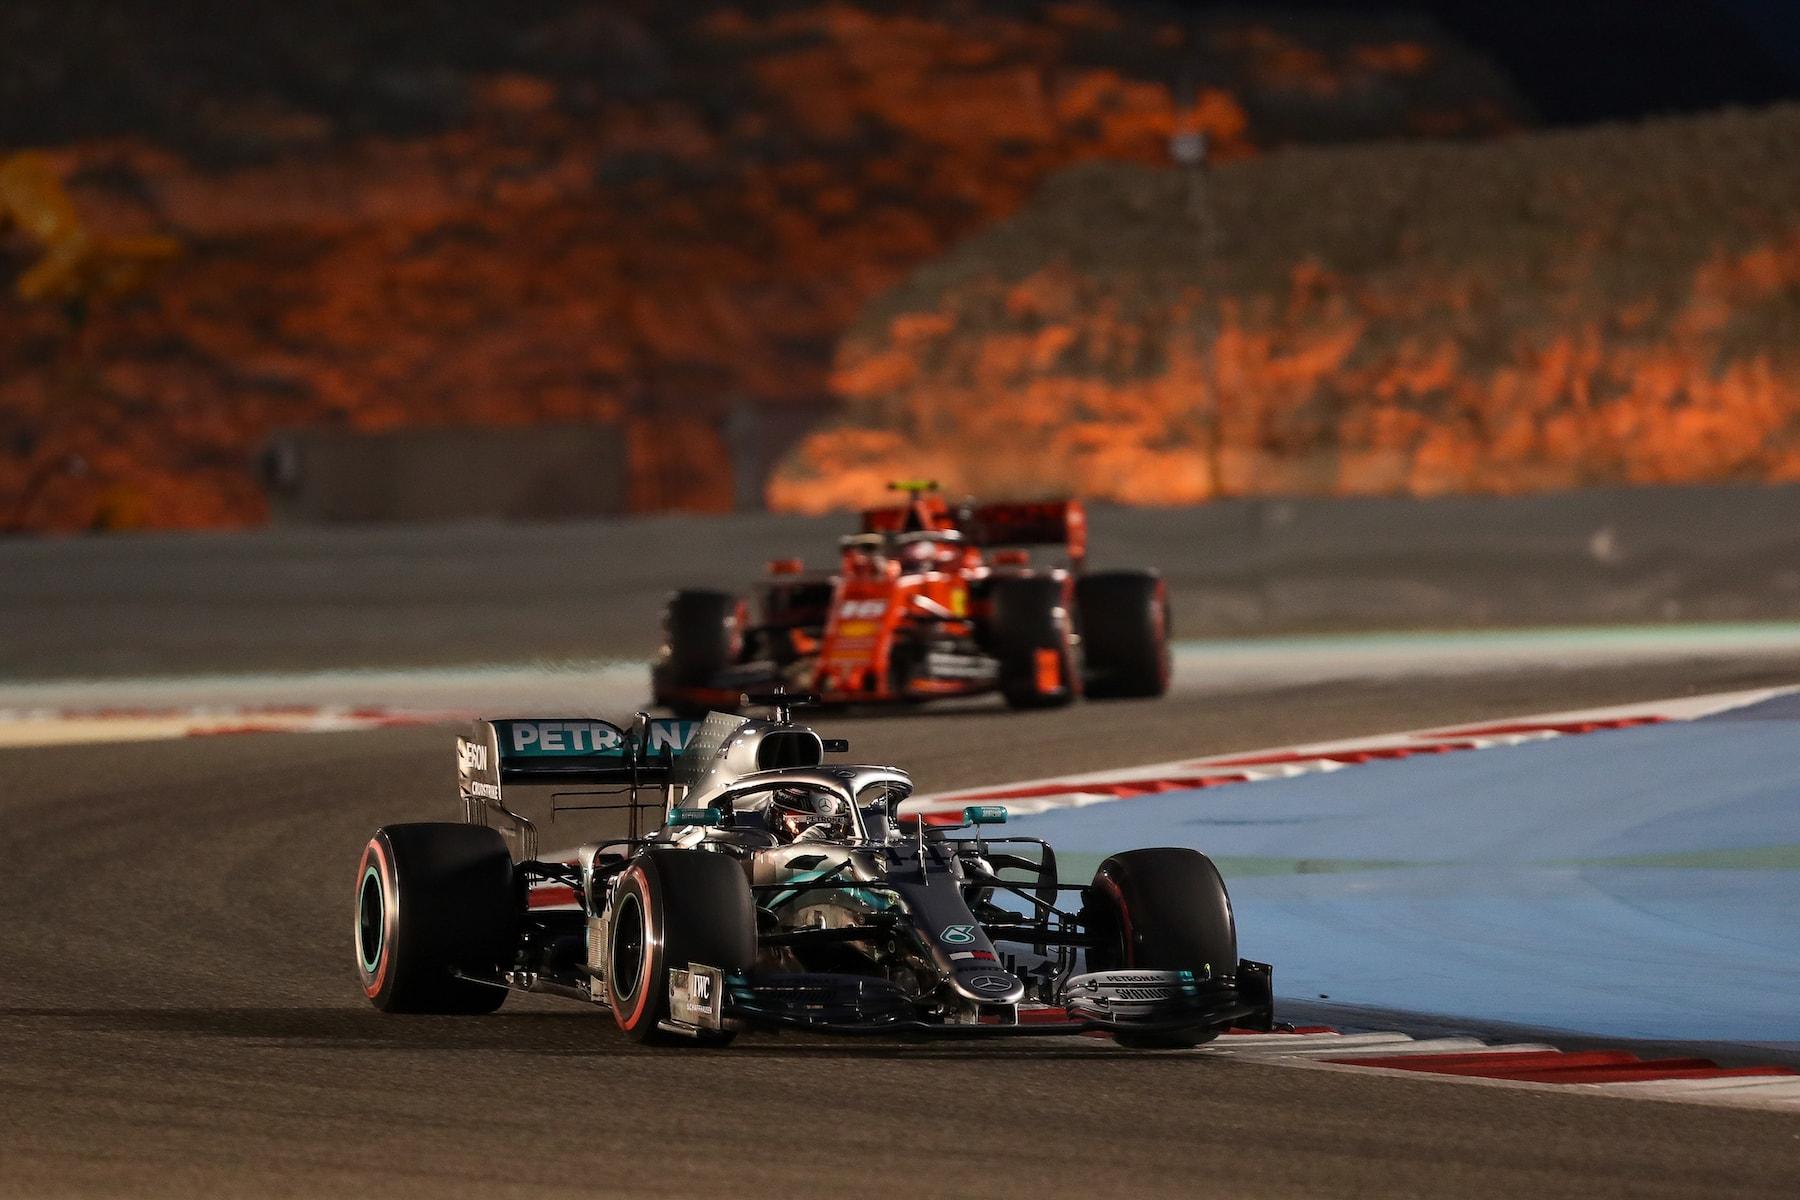 3 7 9 2019 Lewis Hamilton | Mercedes W10 | 2019 Bahrain GP winner 3 copy.jpg